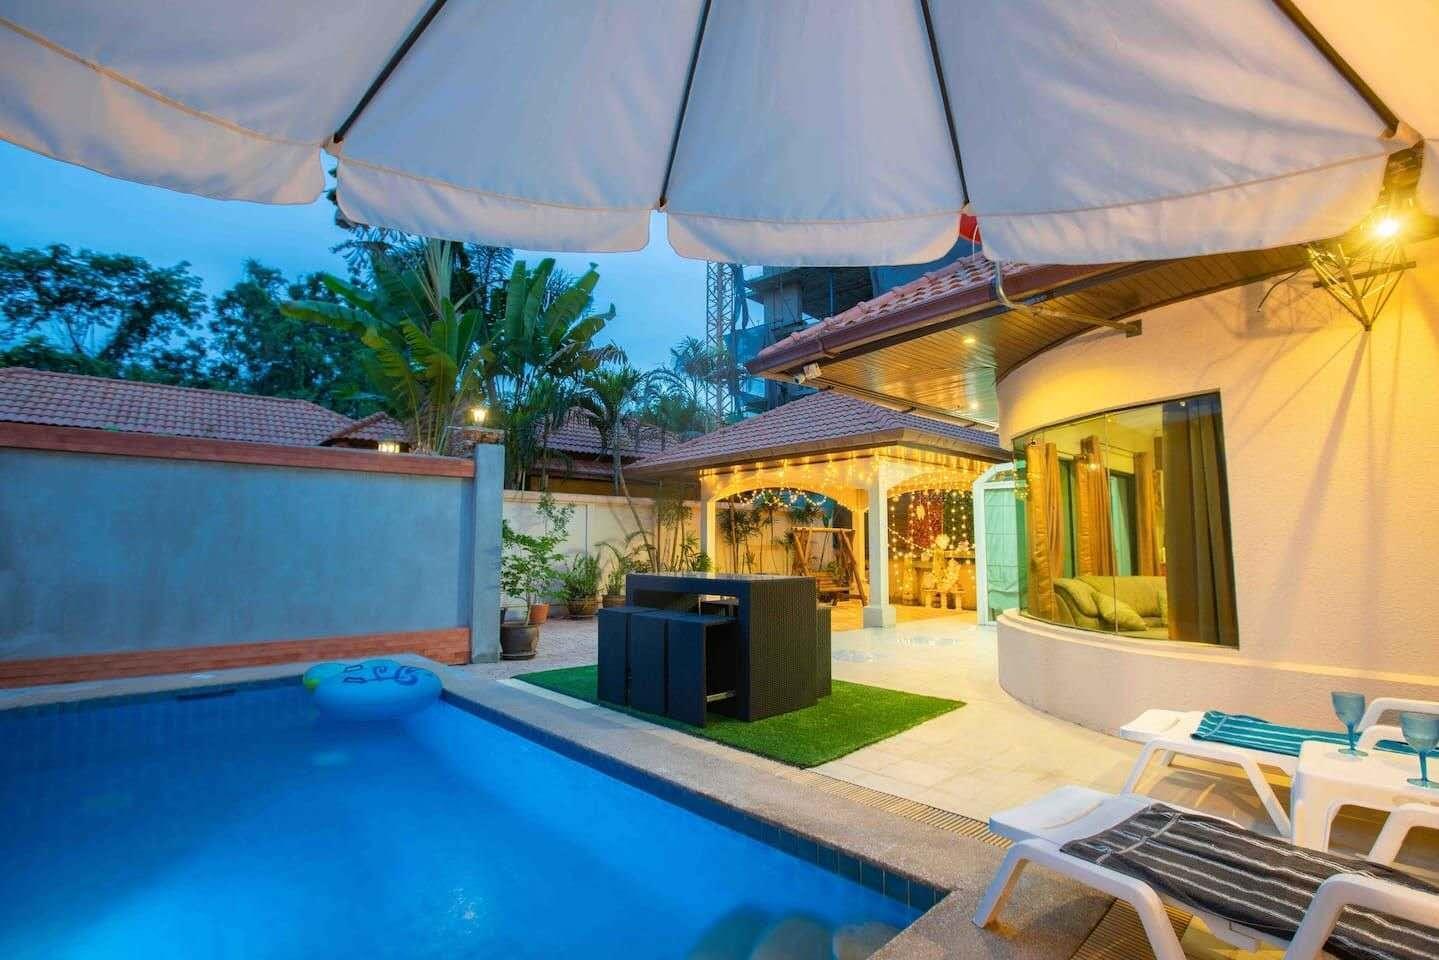 Central pattaya 3 bedroom party pool villa วิลลา 3 ห้องนอน 4 ห้องน้ำส่วนตัว ขนาด 250 ตร.ม. – เขาพระตำหนัก